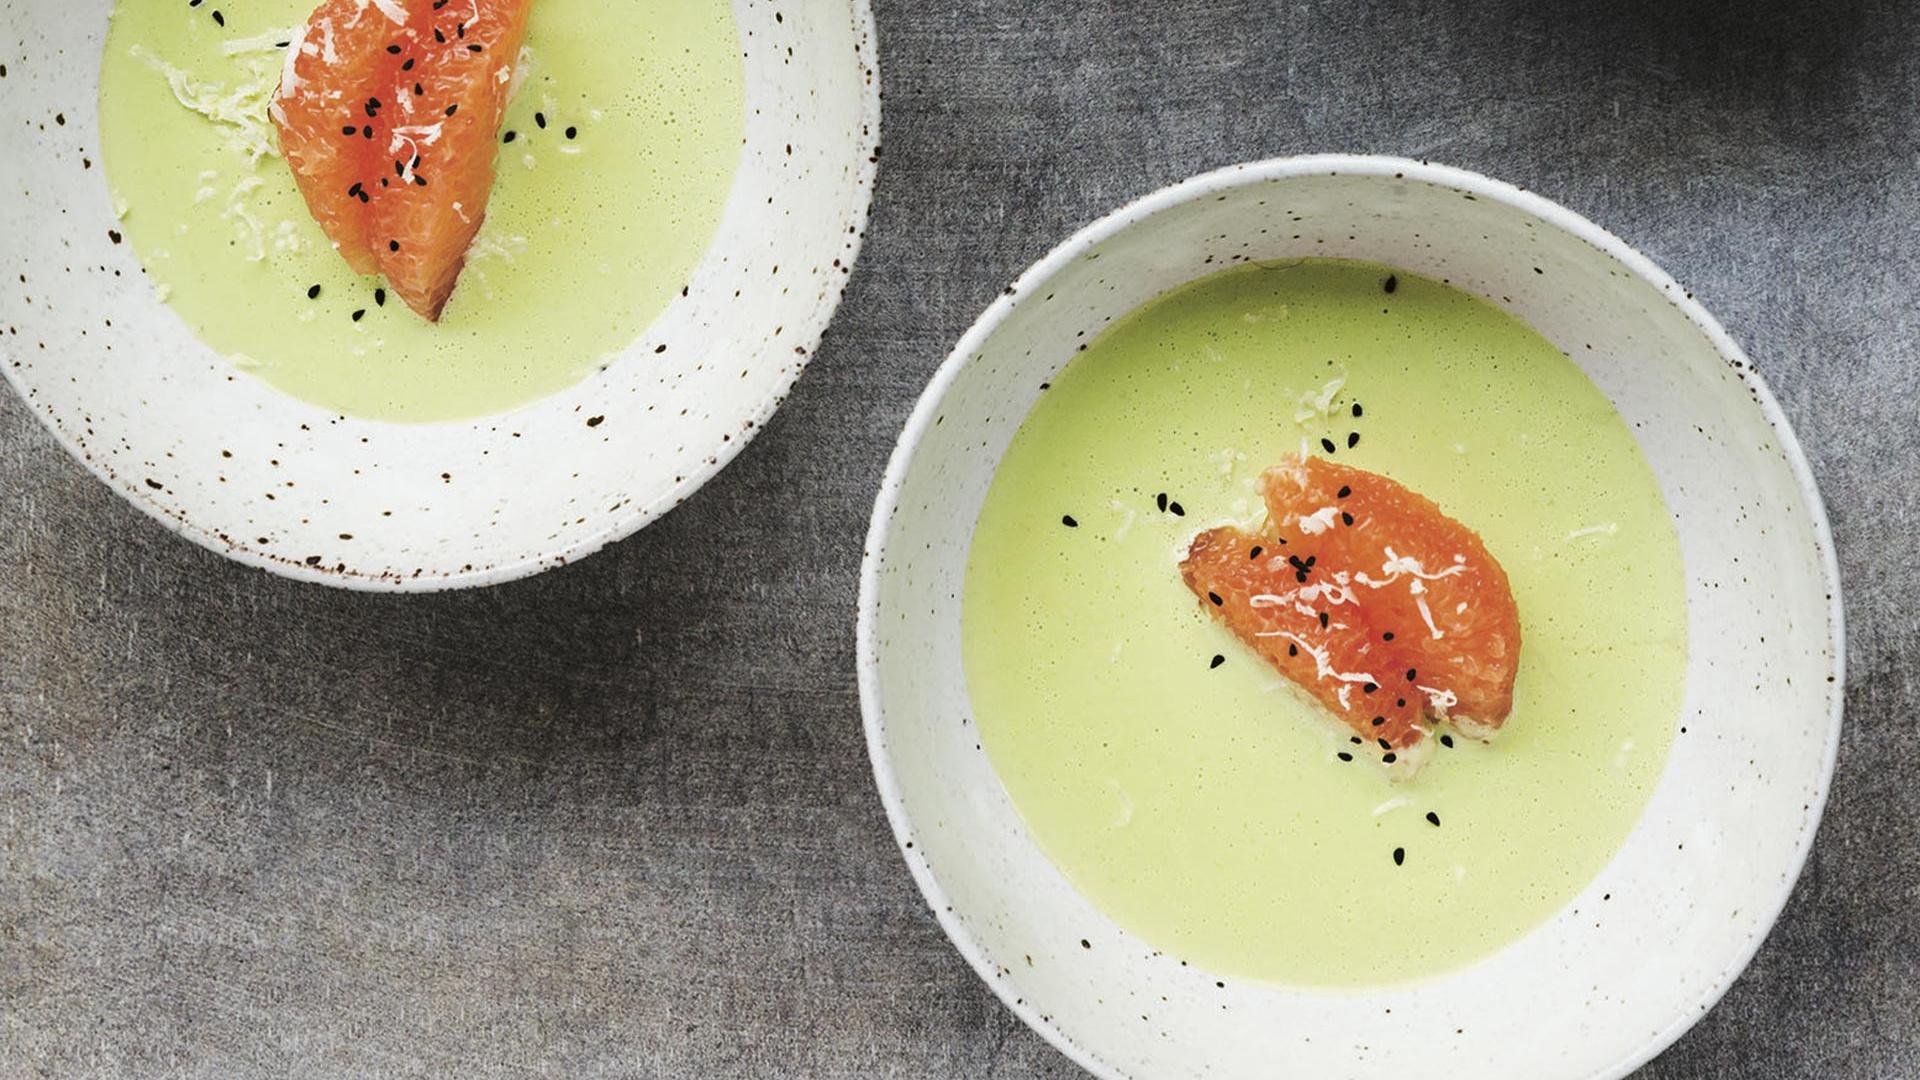 Bäco's creamy romanesco soup with grapefruit, nigella, and fresh horseradish; photography by Dylan + Jeni